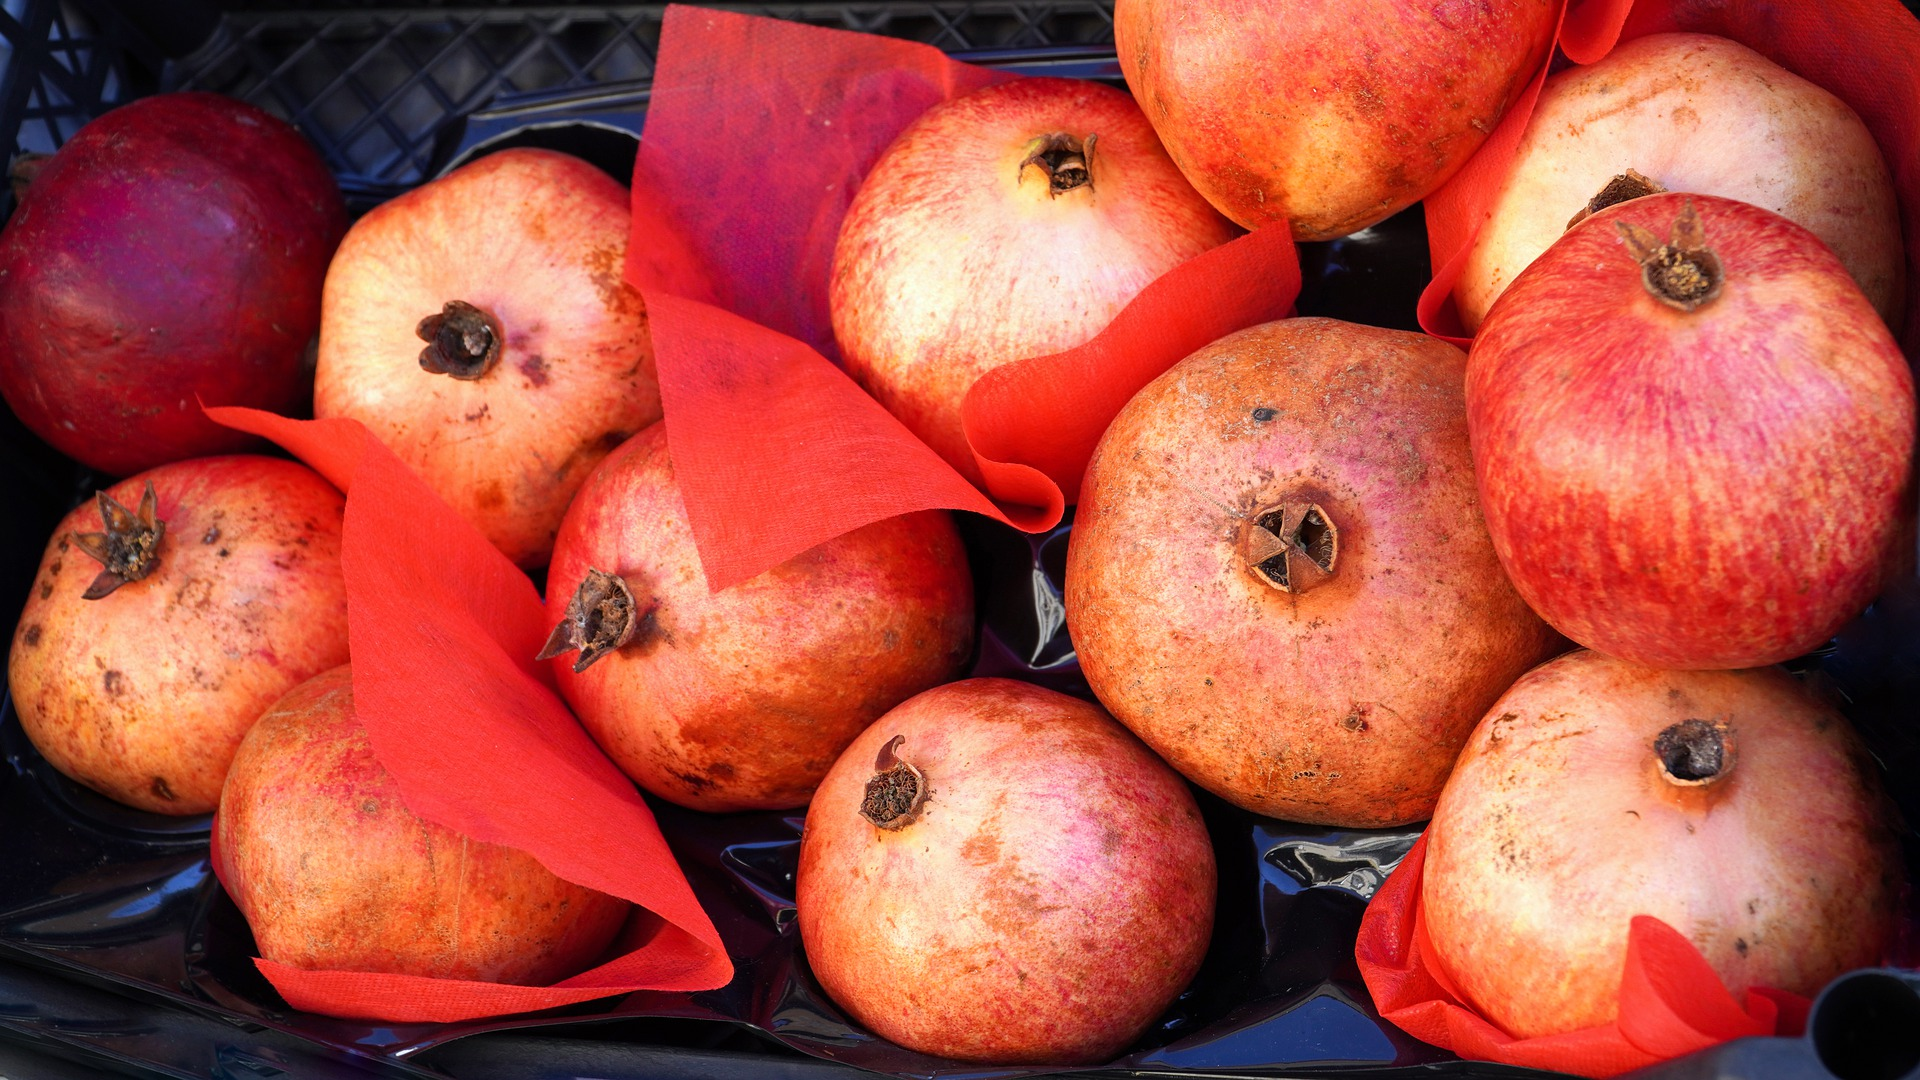 pomegranate-4963824_1920